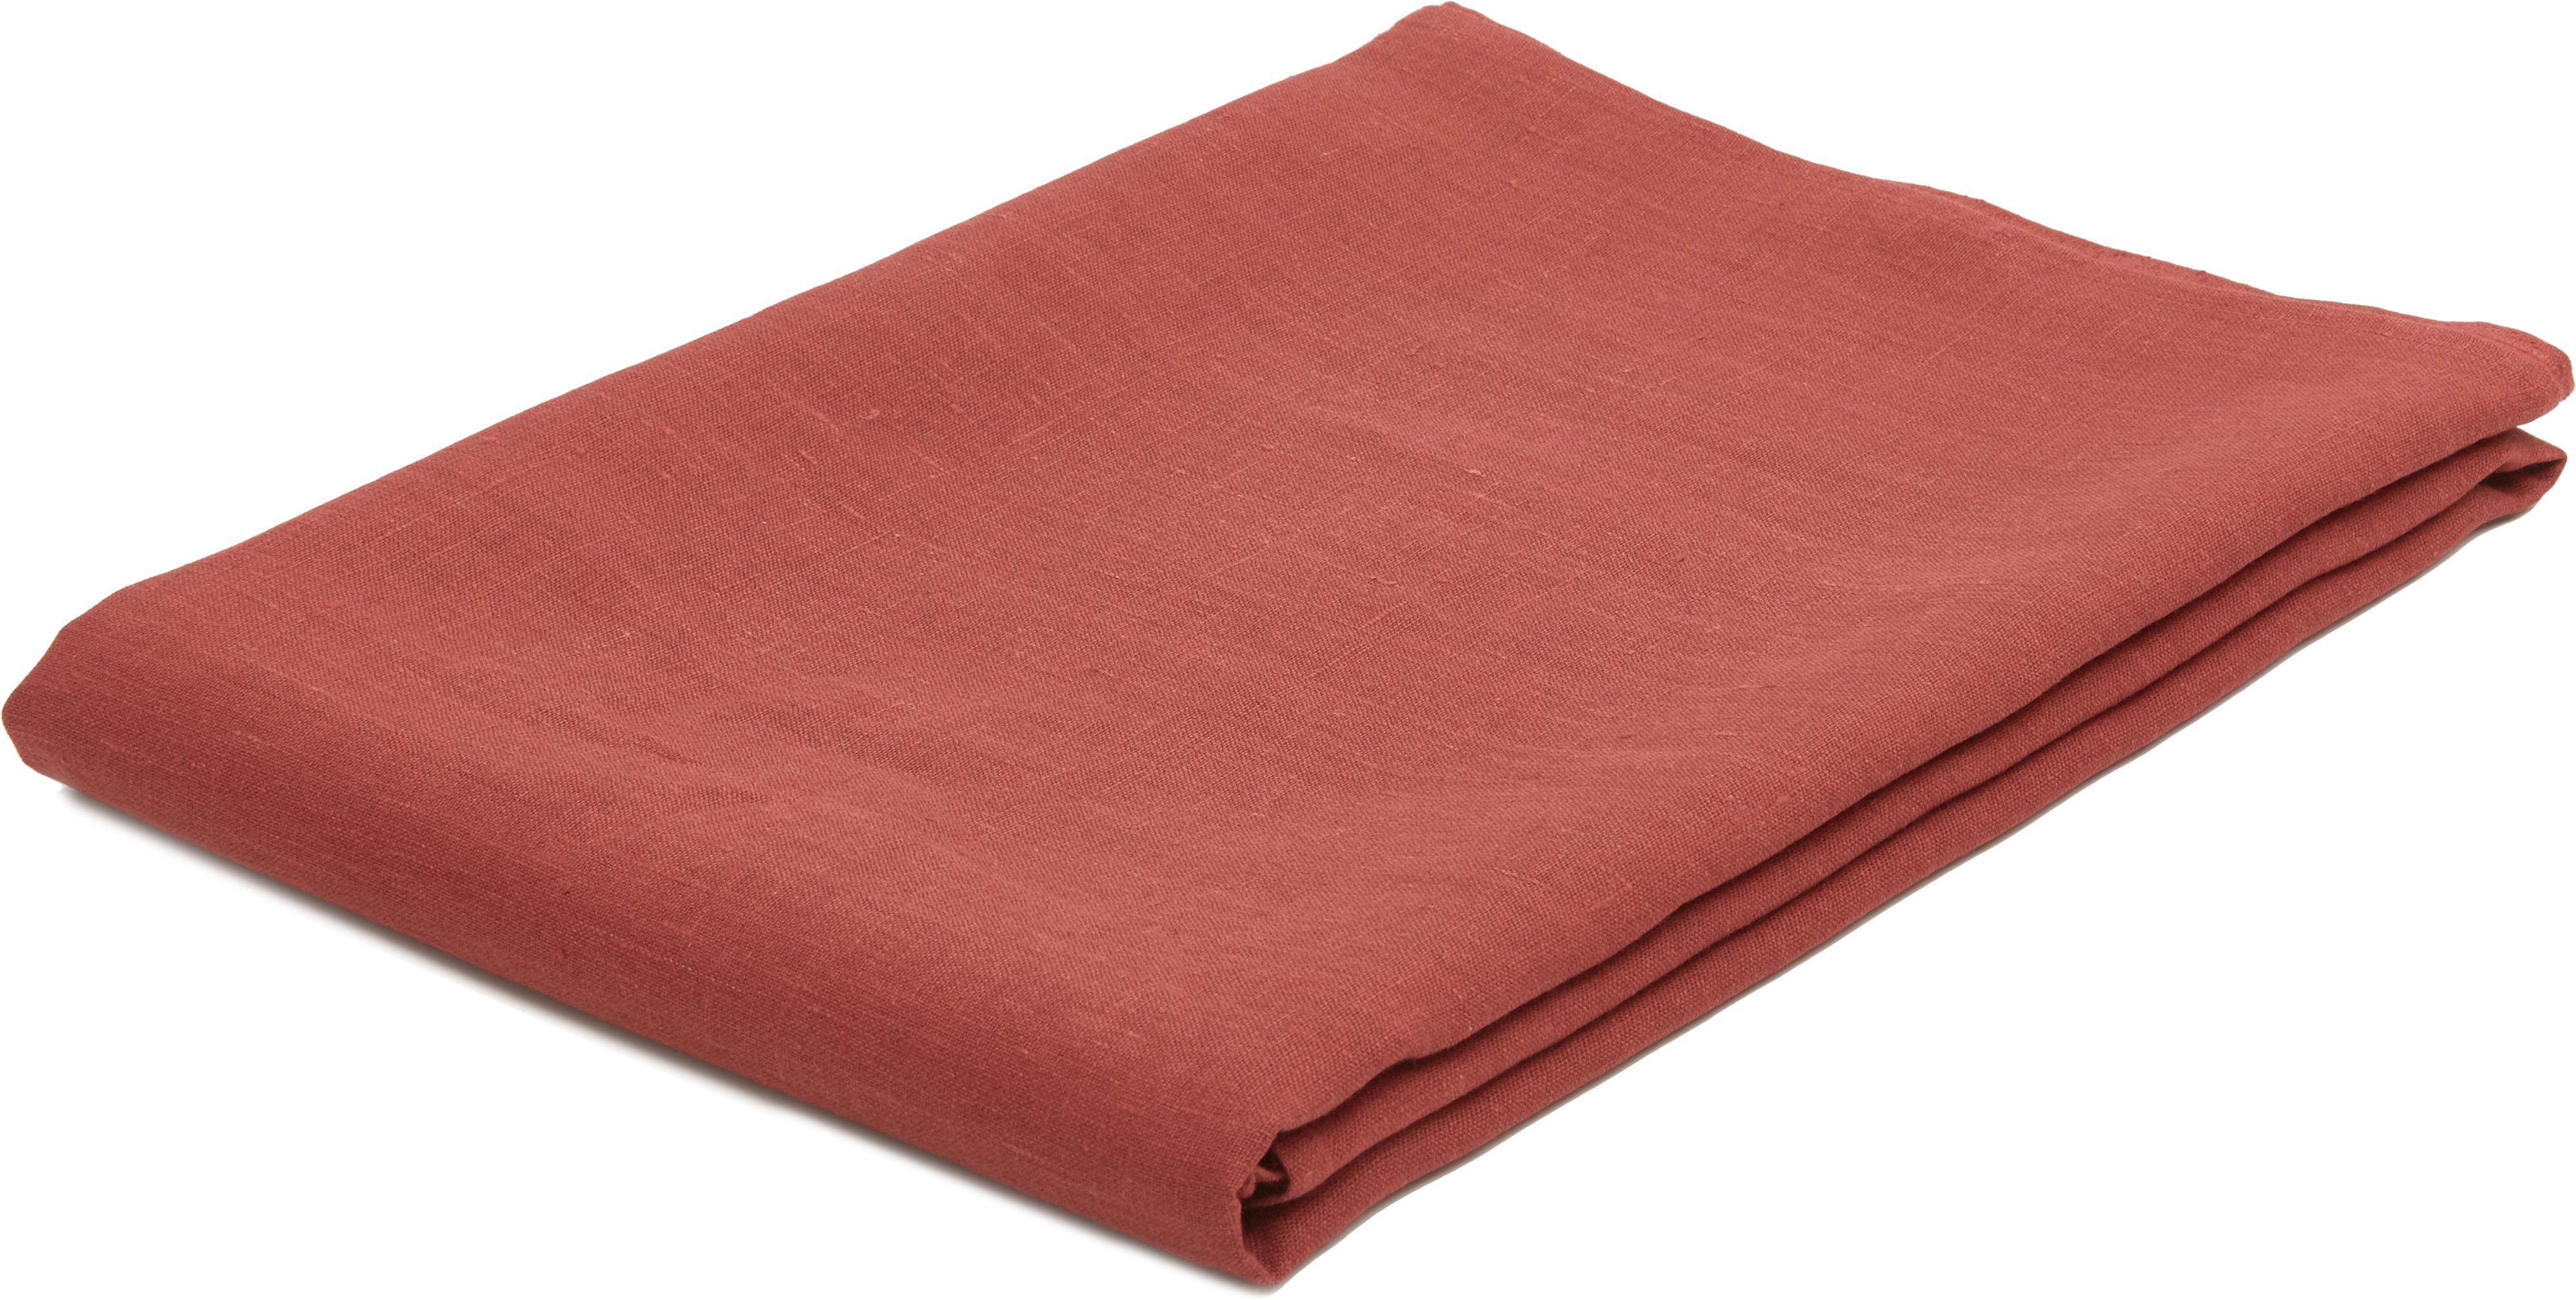 Tovaglia in lino Heddie, 100% lino, Rosso, Larg. 145 x Lung. 200 cm